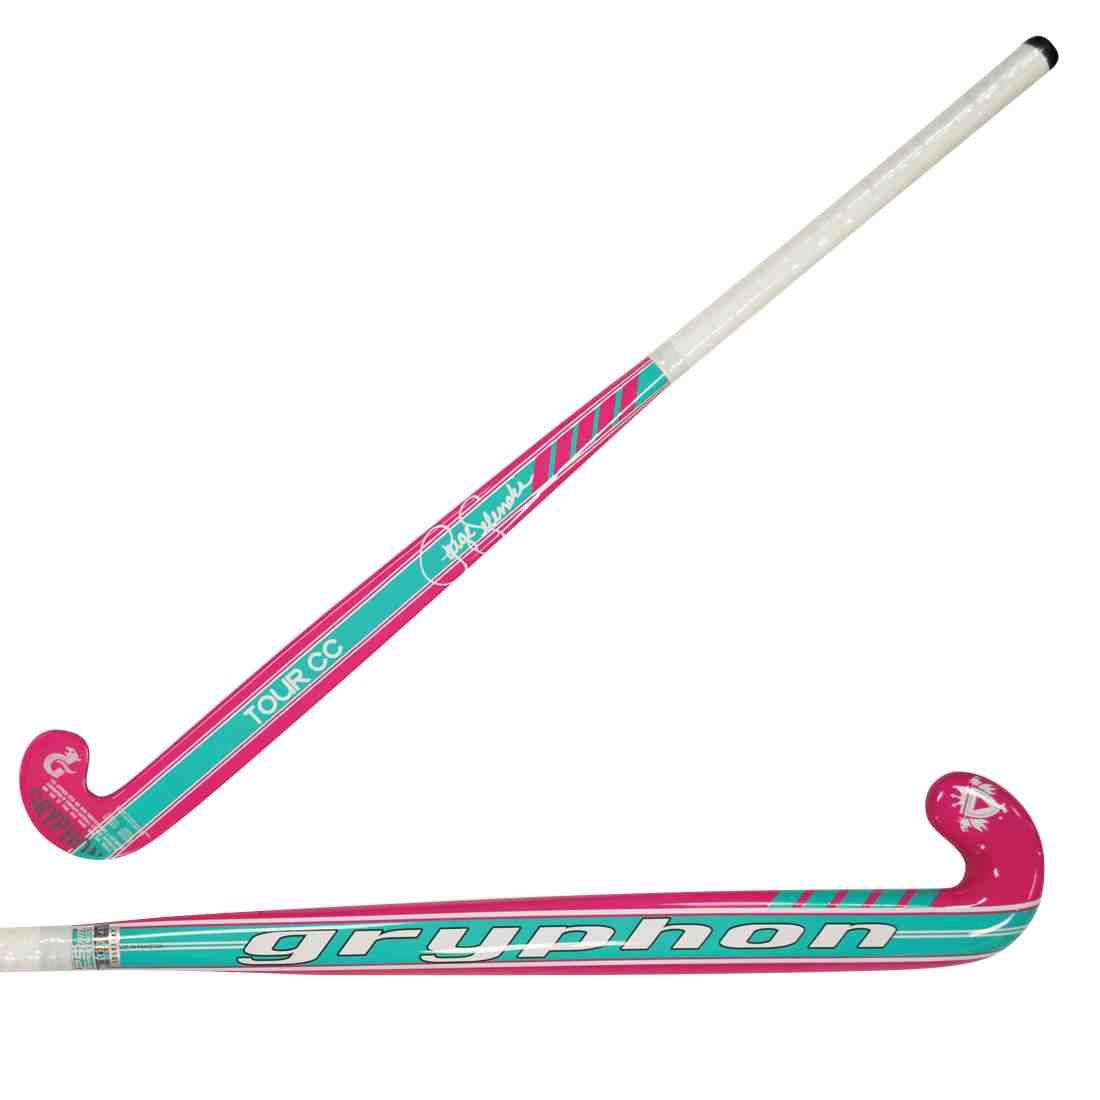 Gryphon Field Hockey Sticks Field Hockey Sticks Field Hockey Hockey